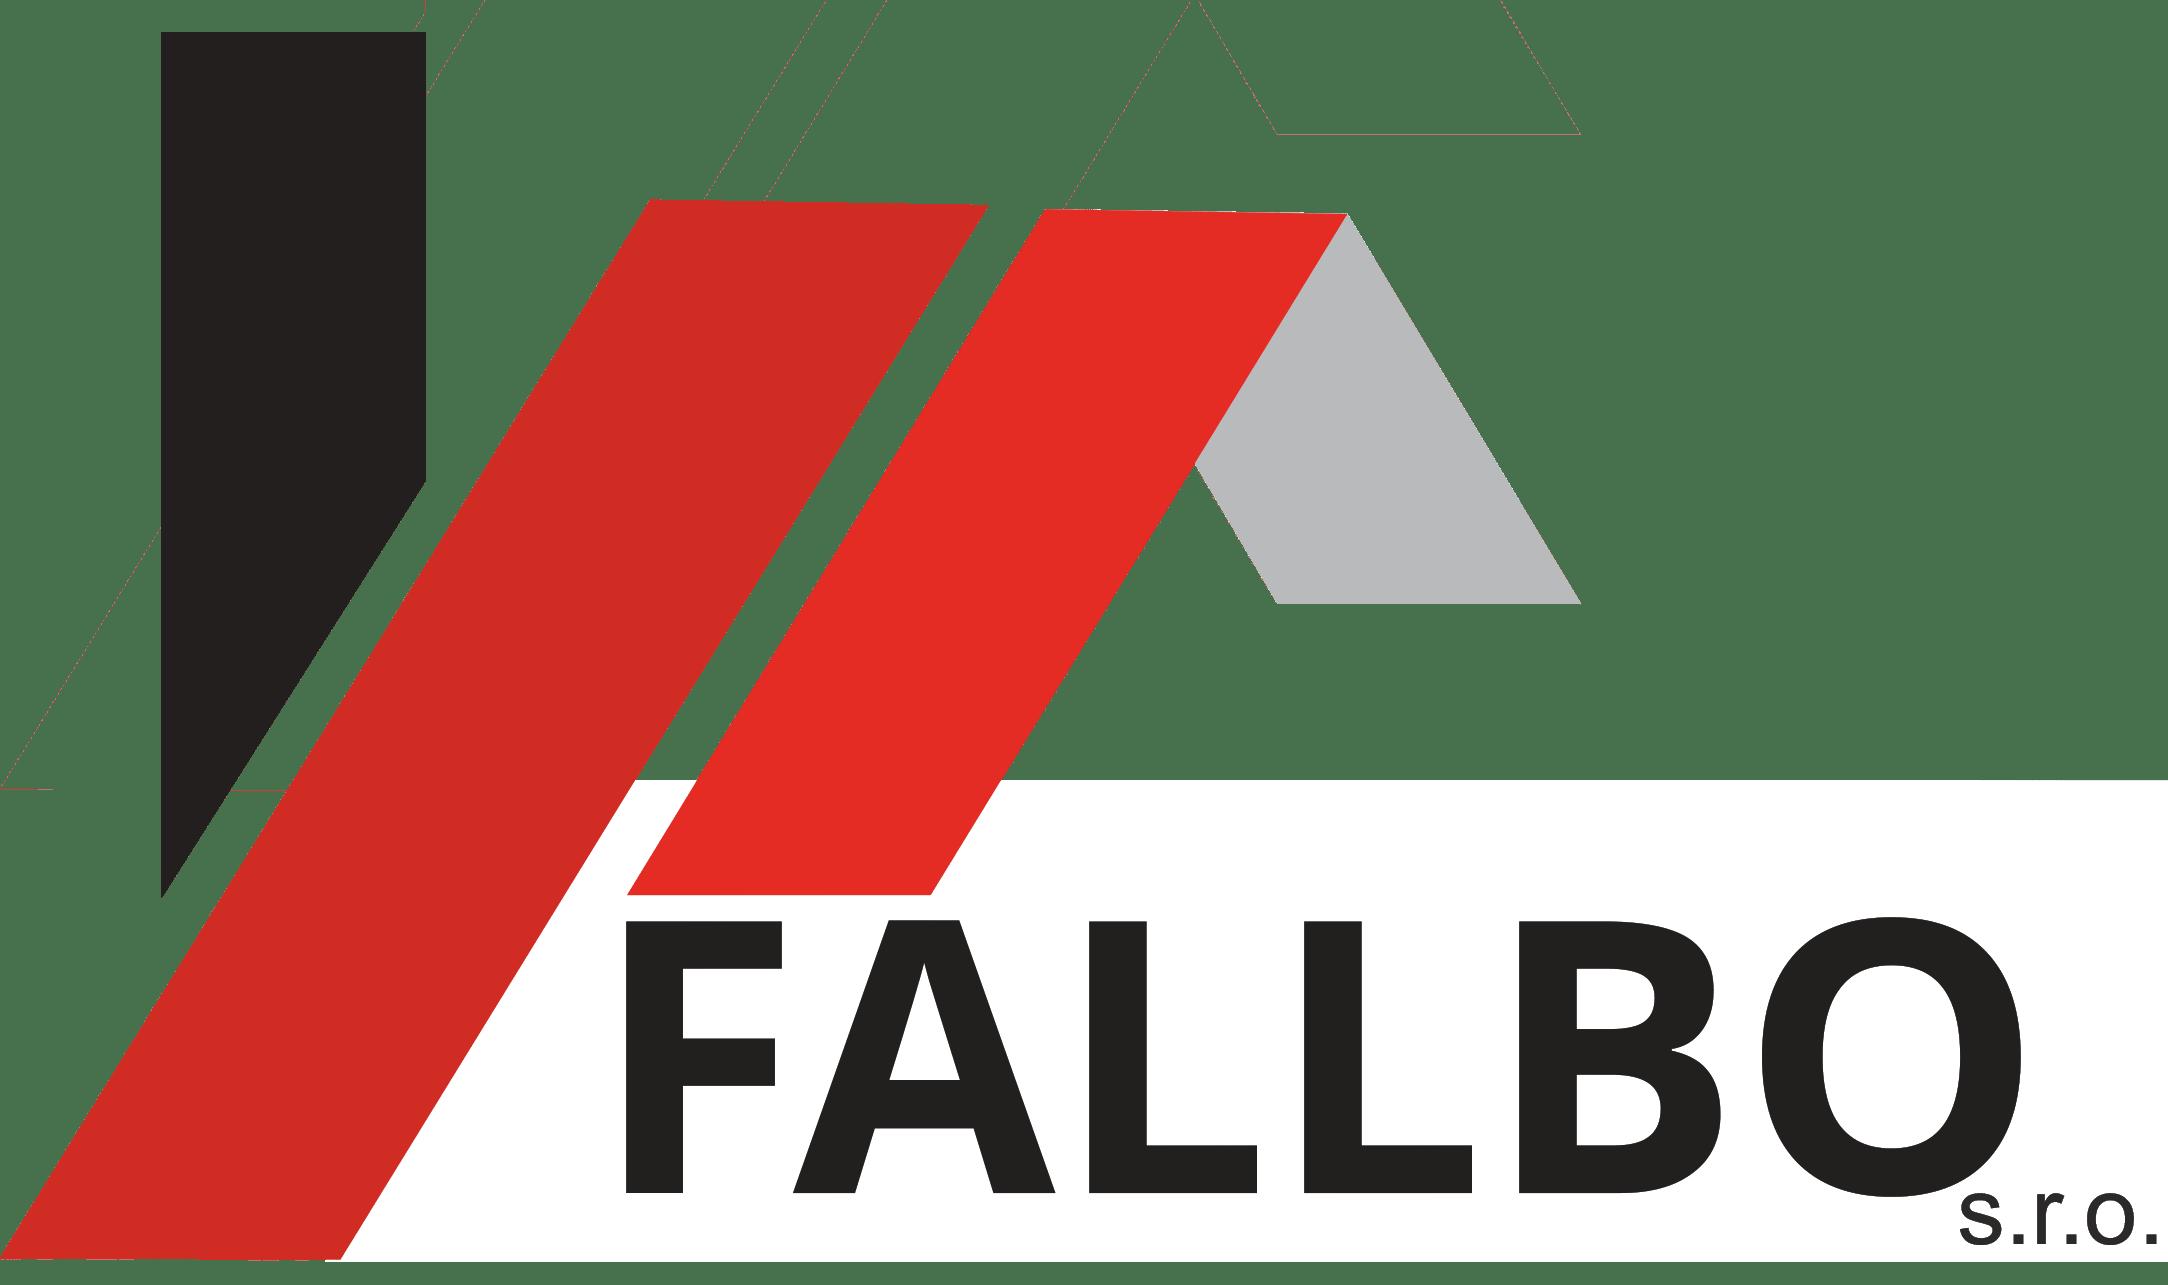 FALLBO s.r.o.